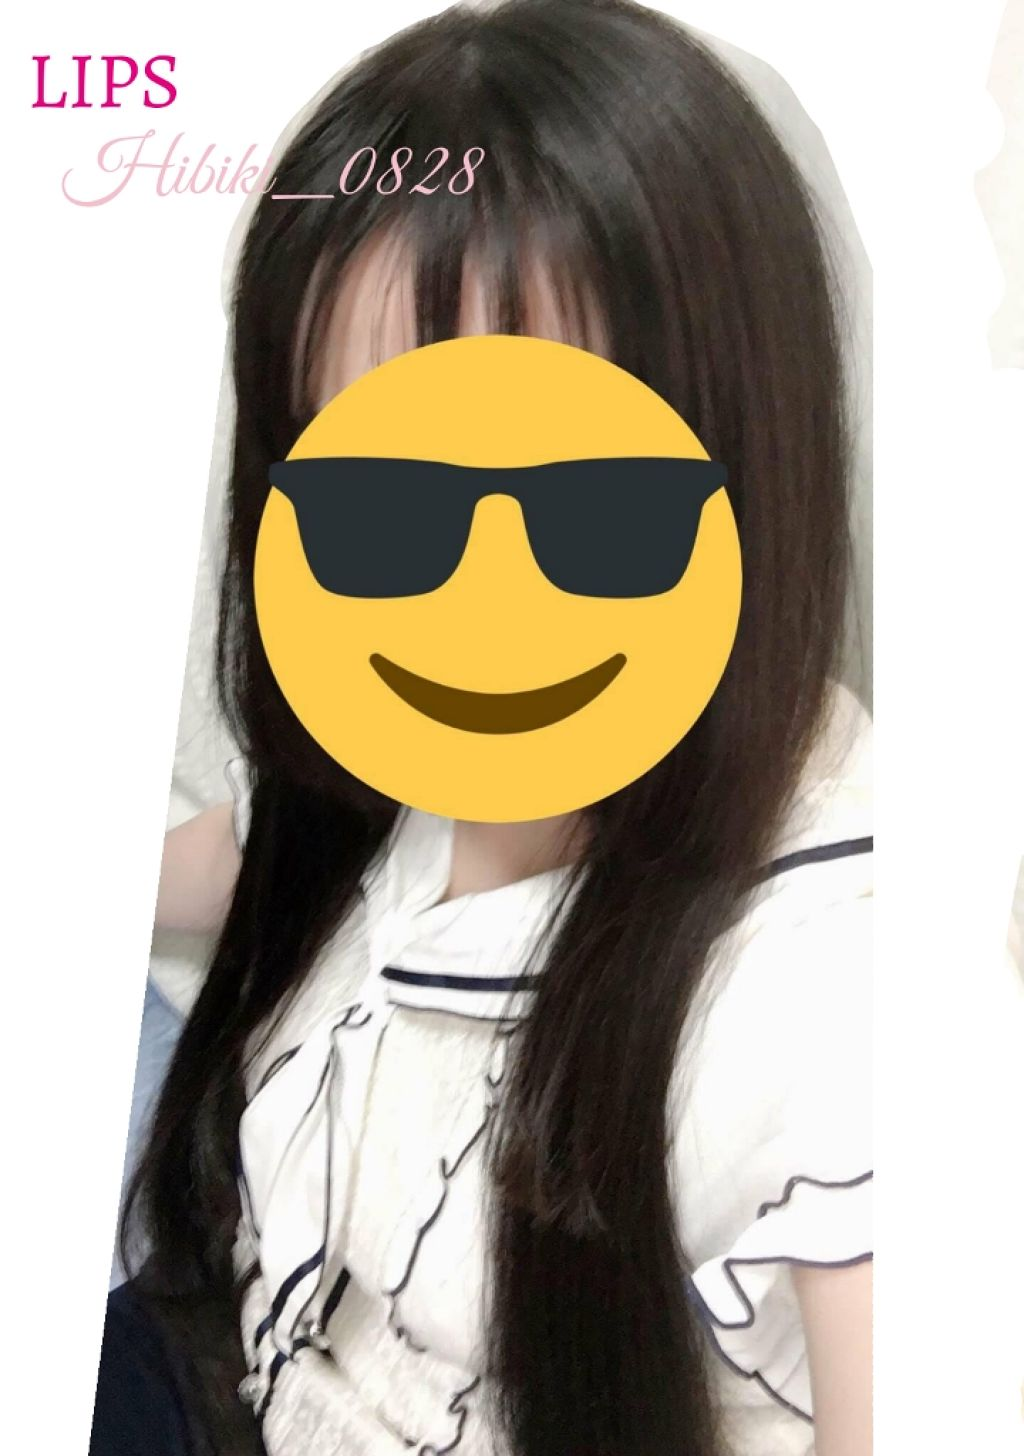 https://cdn.lipscosme.com/image/5f6784d07d91f258f5b7736e-1568903346-thumb.png